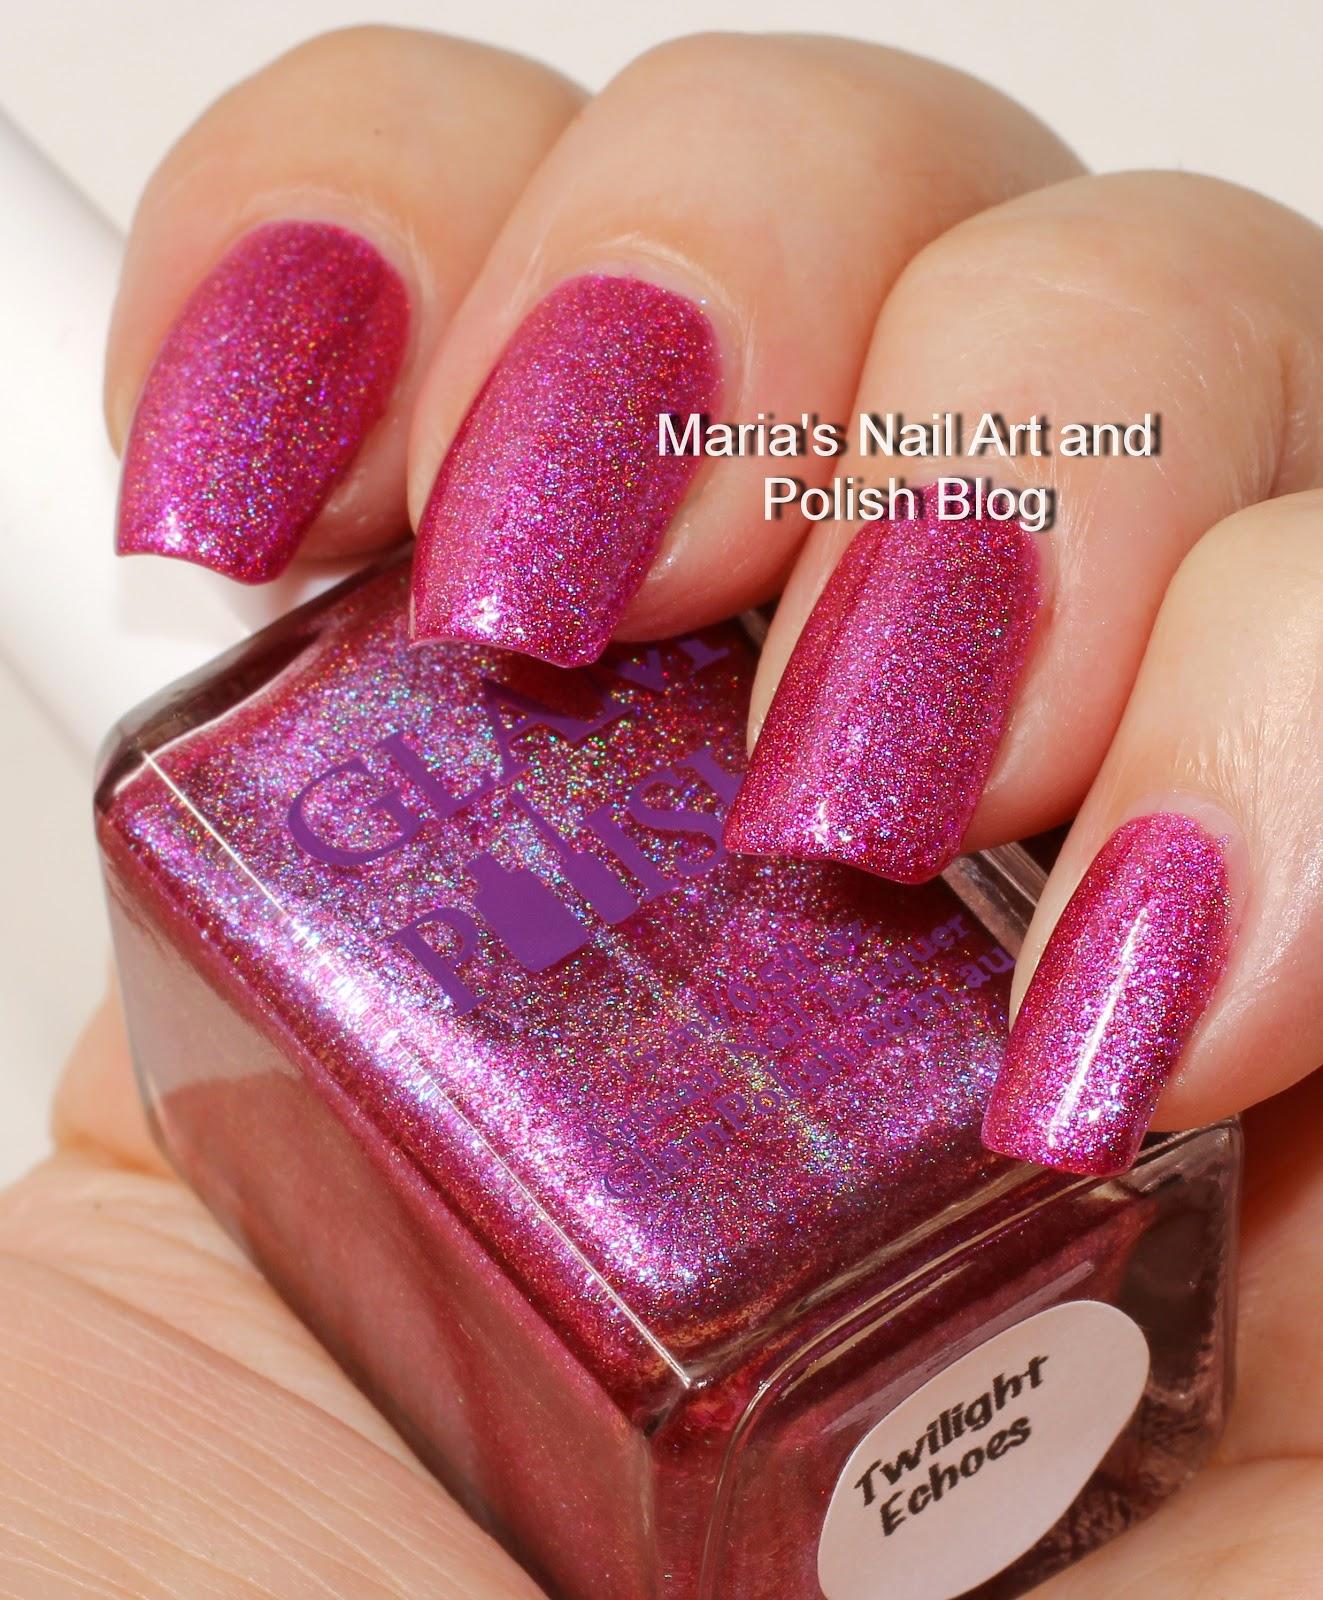 Marias Nail Art And Polish Blog Glam Polish Twilight Echoes Swatches